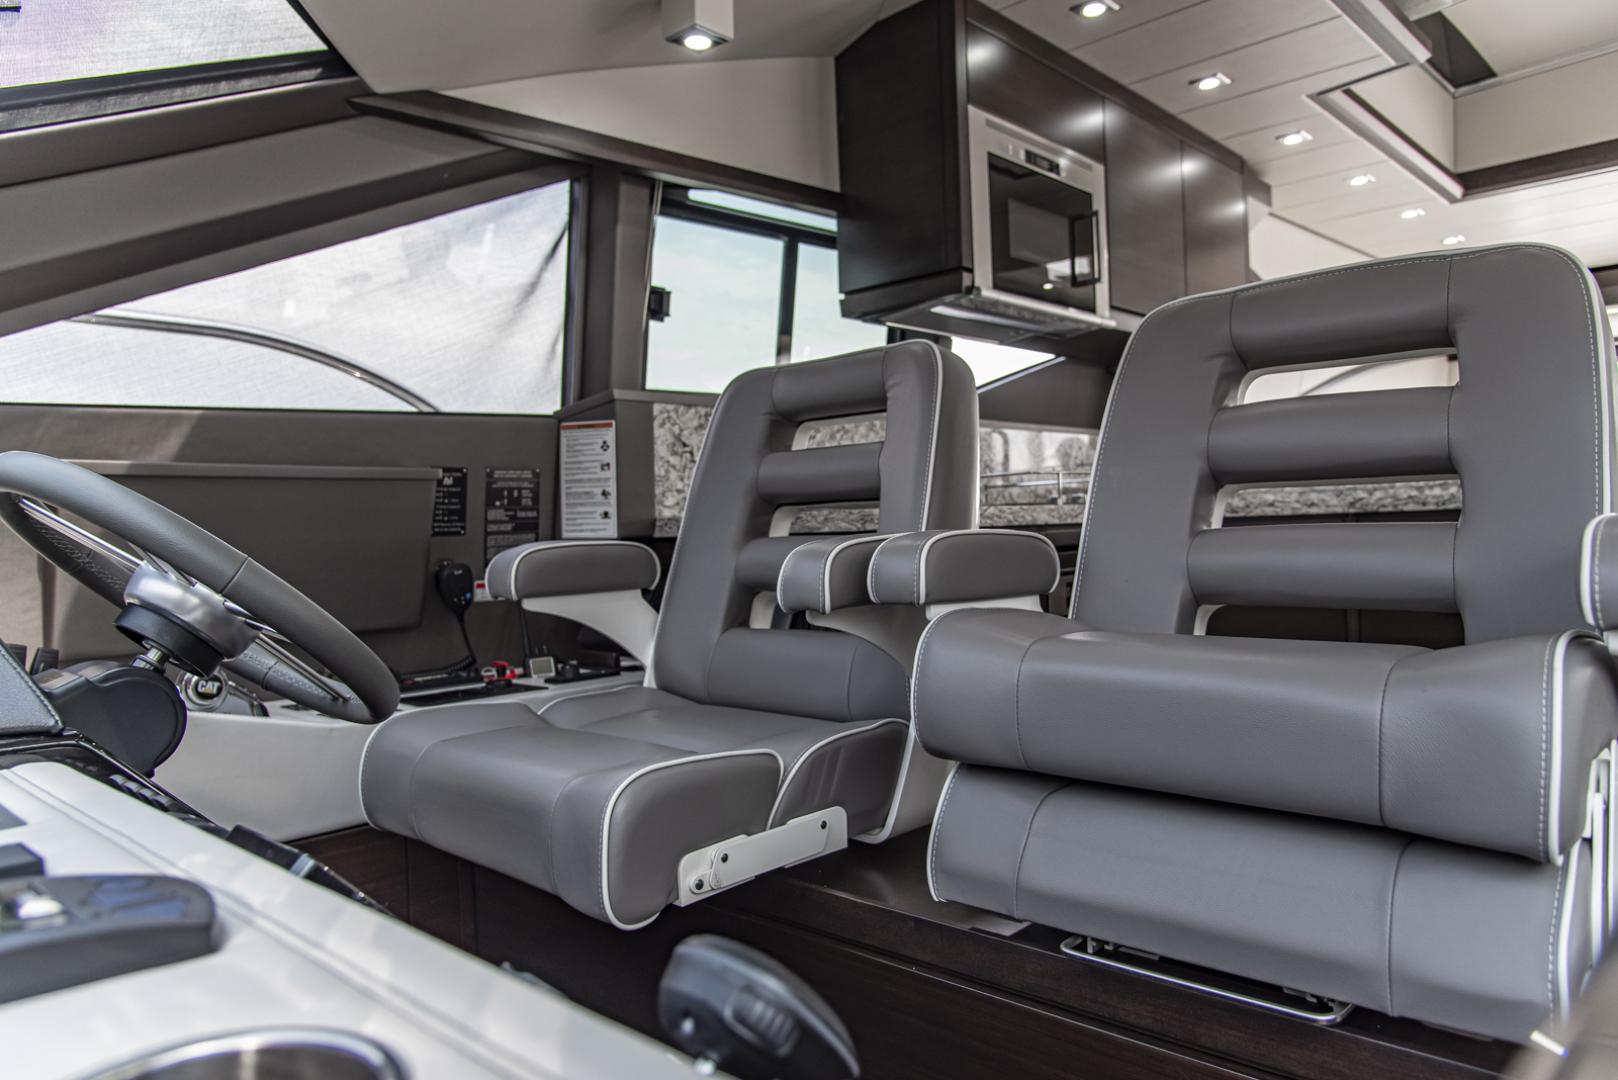 Neptunus-Motor Yacht Express 2018-LIQUID WISDOM Grand Haven-Michigan-United States-Two tone Pompanette helm chairs-1484976 | Thumbnail